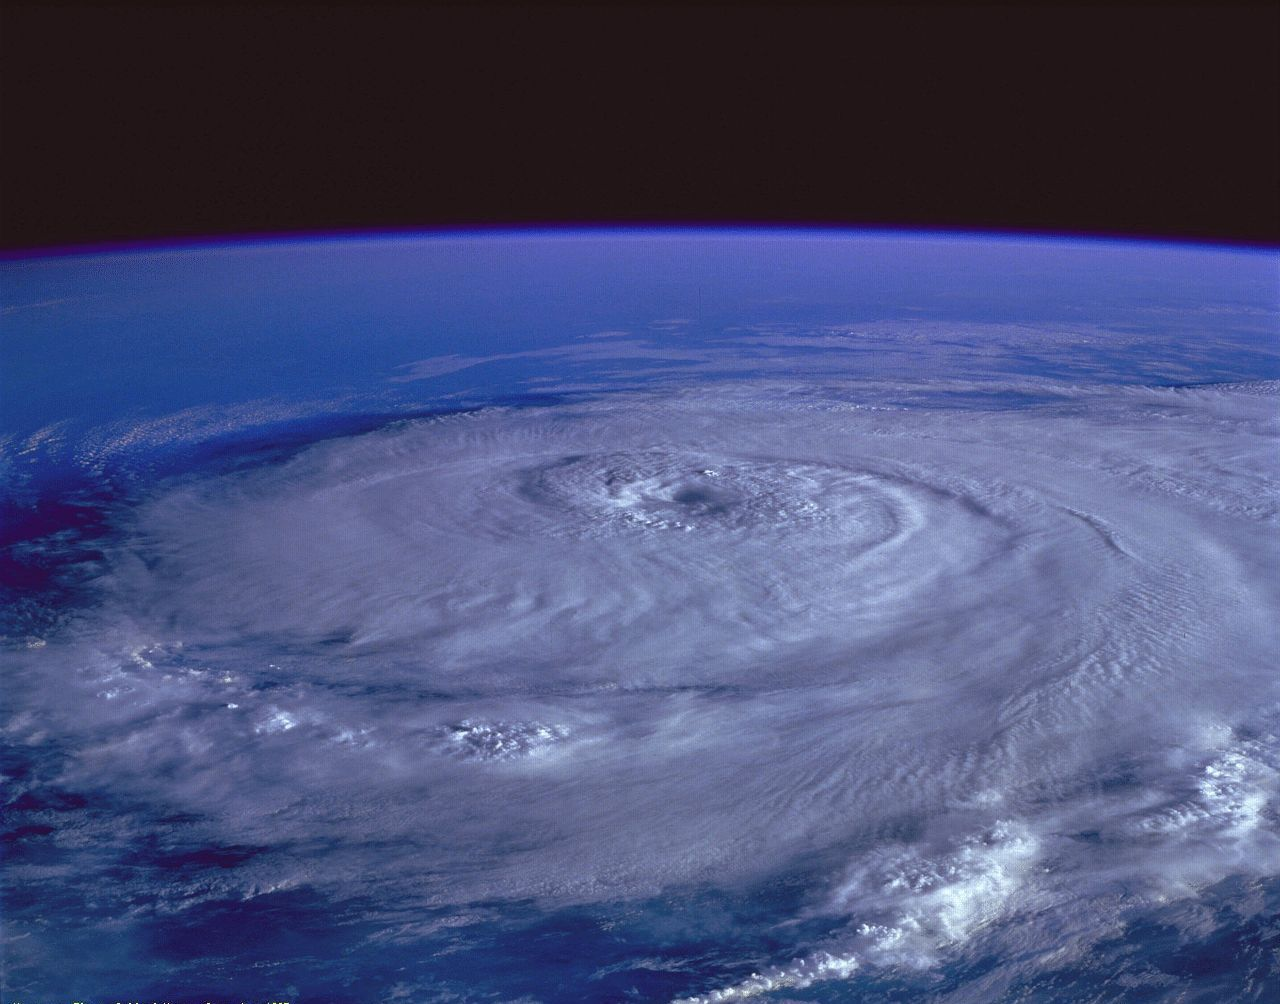 Hurricane Elena Gulf Of Mexico September 1985 1280x1004 R Spaceporn Hurricane Season Hurricane Pictures Storm Images